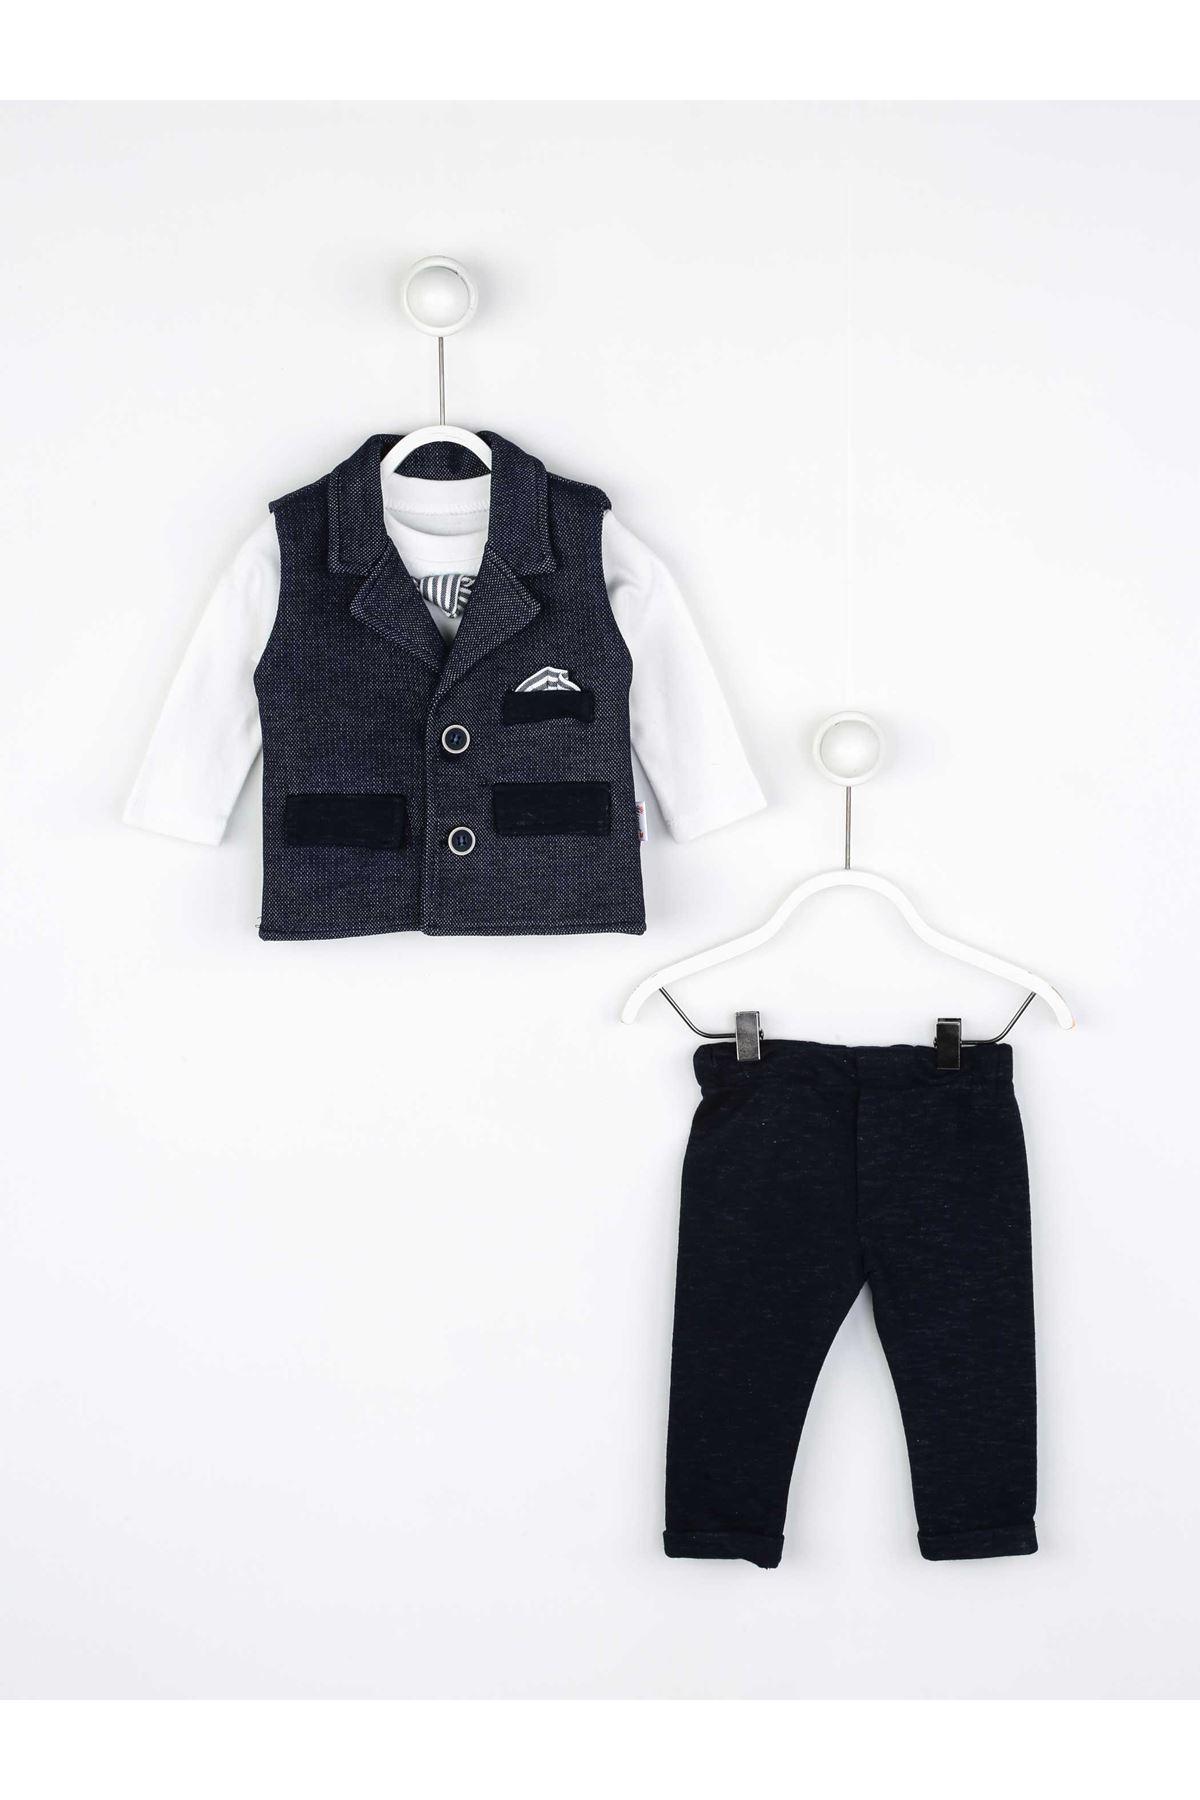 Navy blue baby boy 3 piece sets suits cotton gentleman babies models